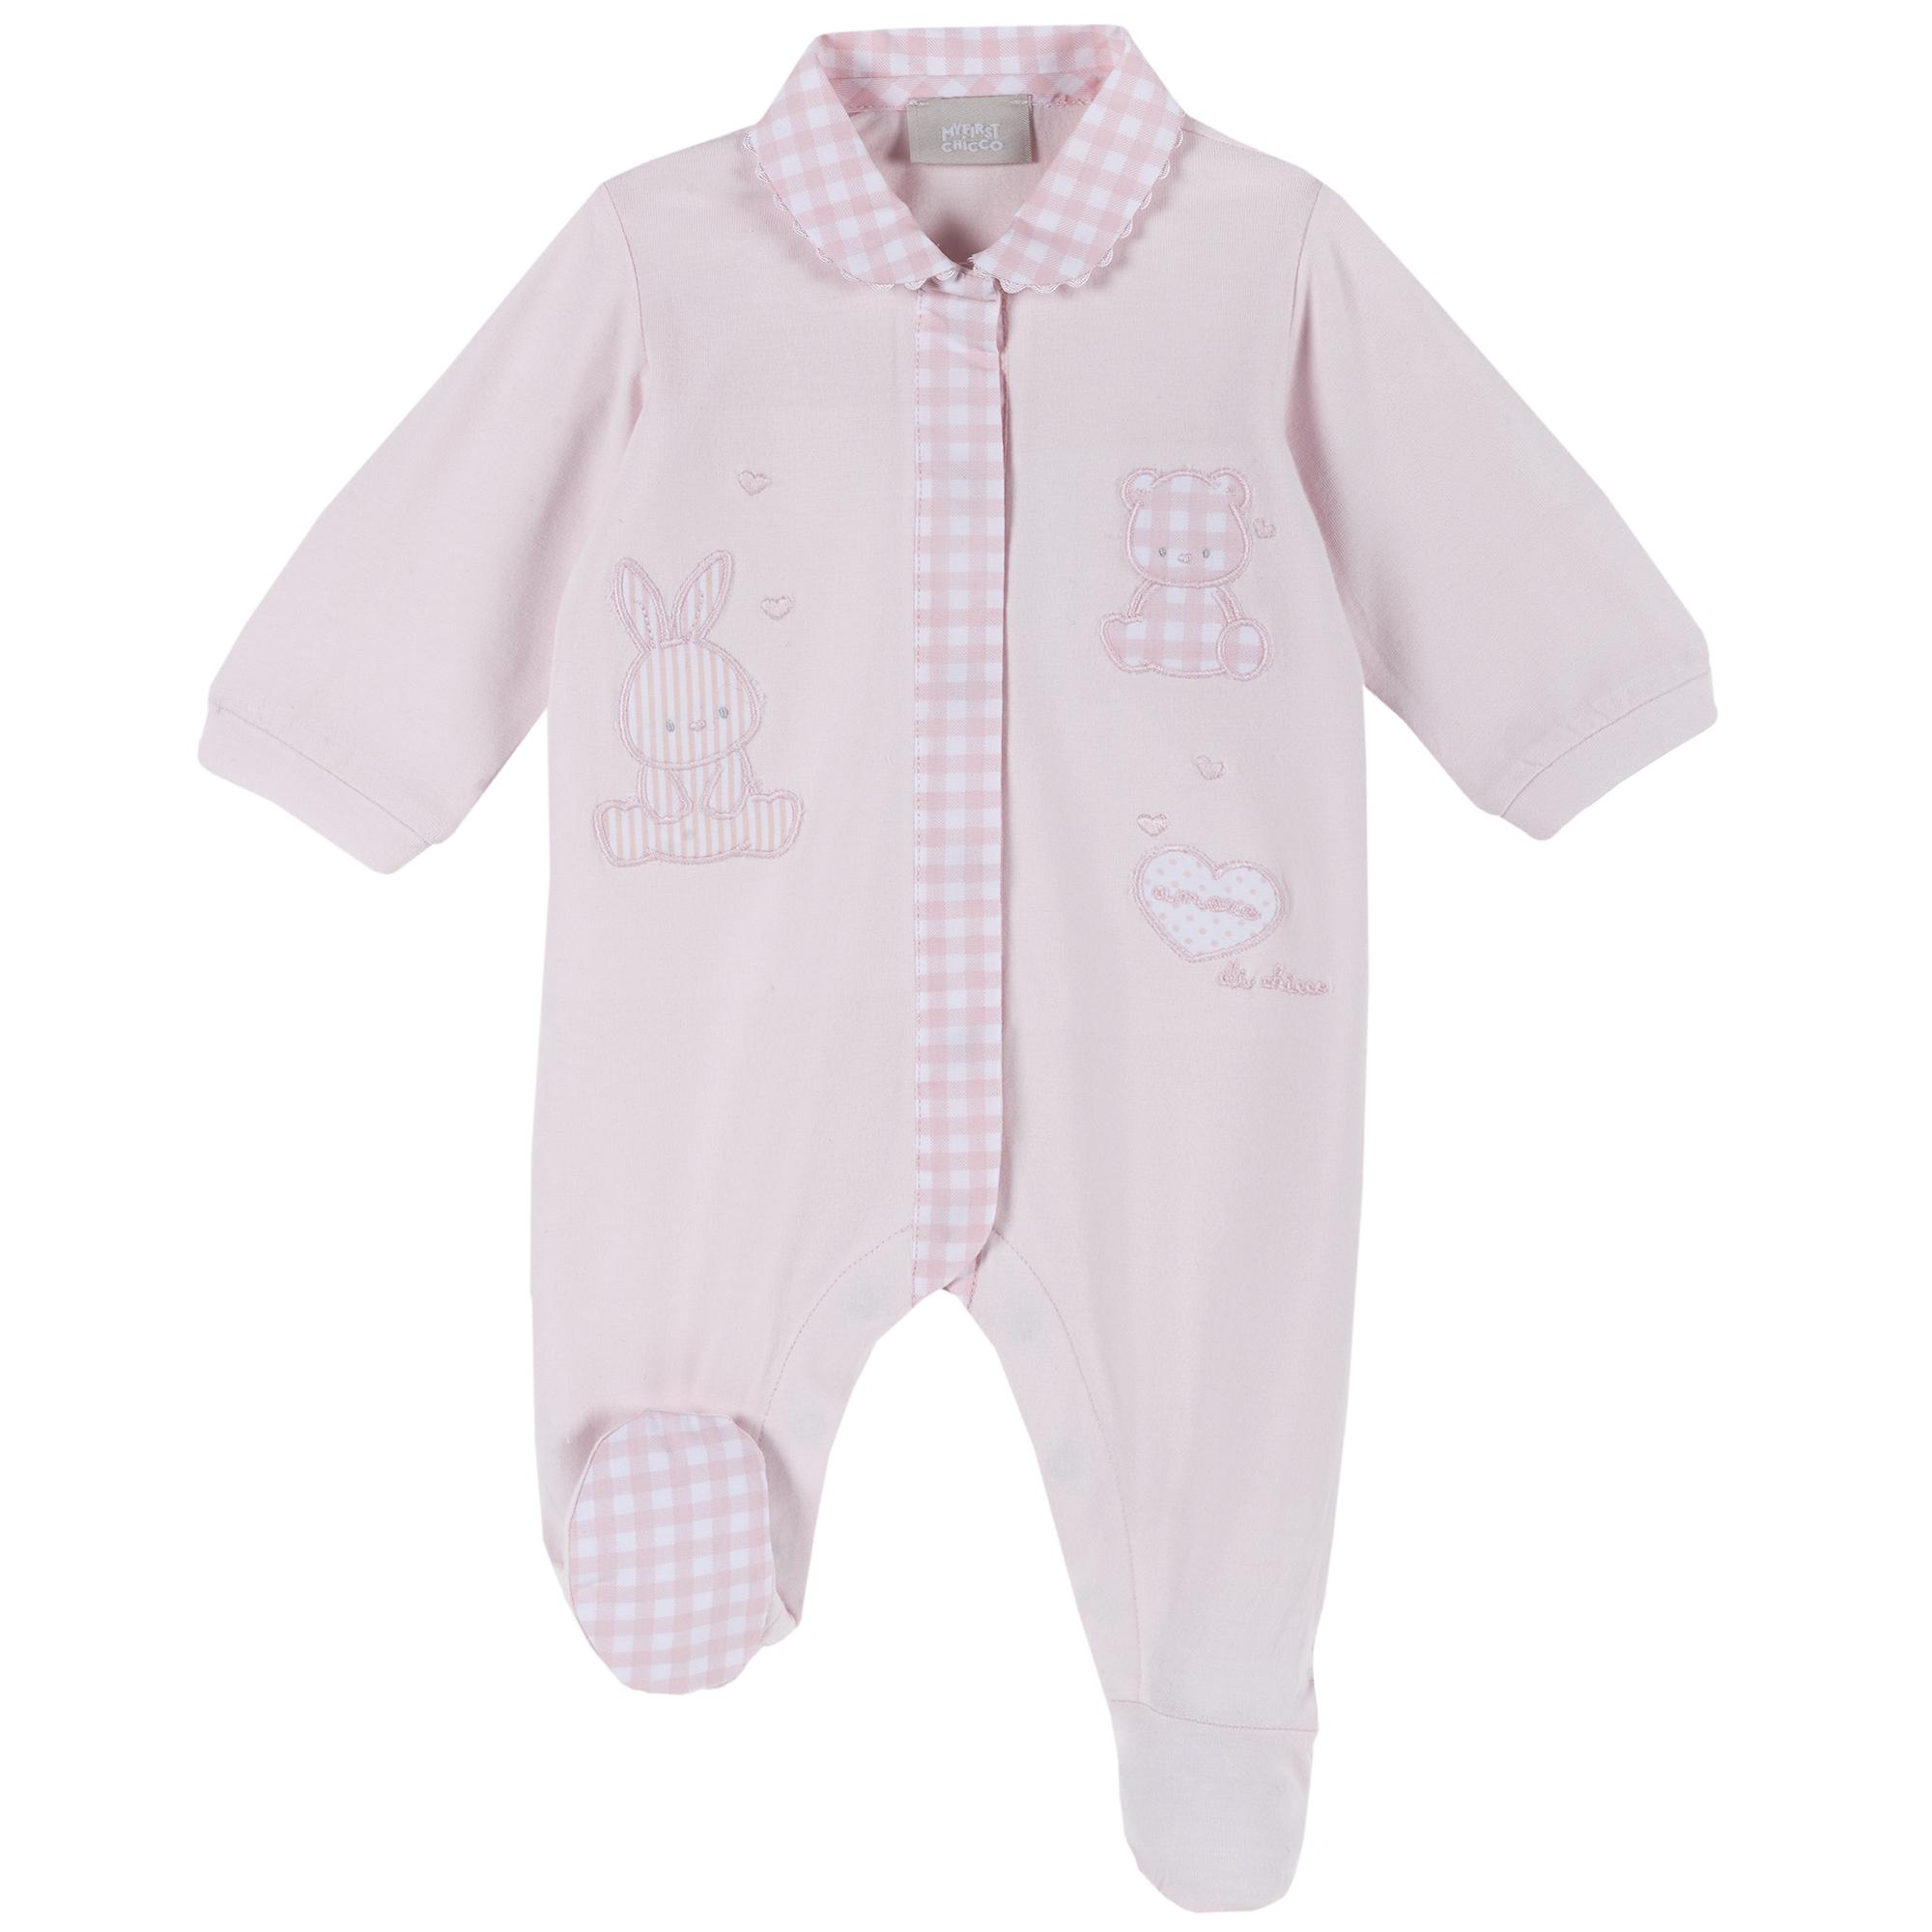 Salopeta bebelusi Chicco, maneca lunga, roz, 21754 din categoria Salopete/Body